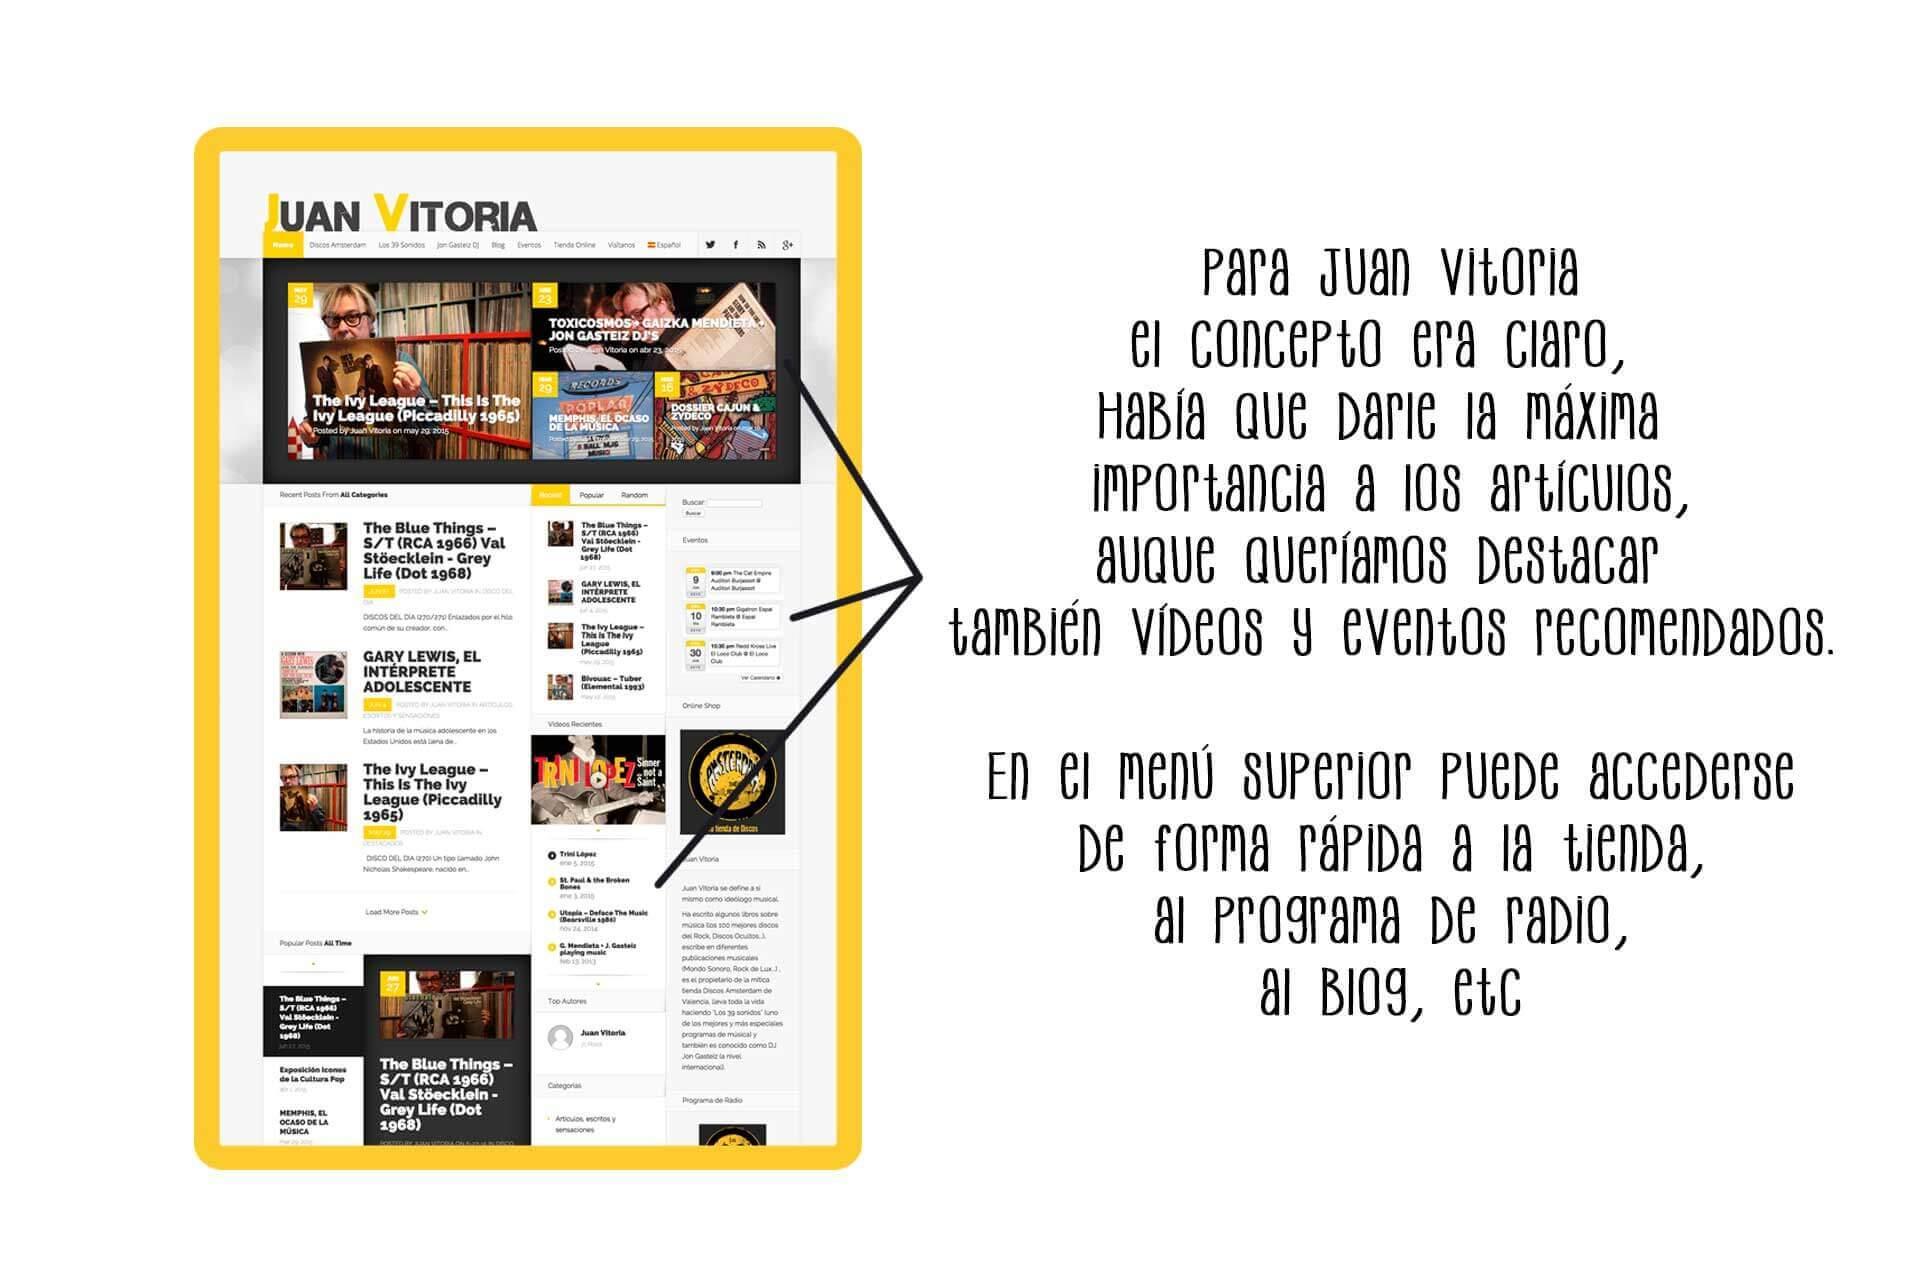 Página web Juan Vitoria (Discos Amsterdam ) noticias | The Superway Webs